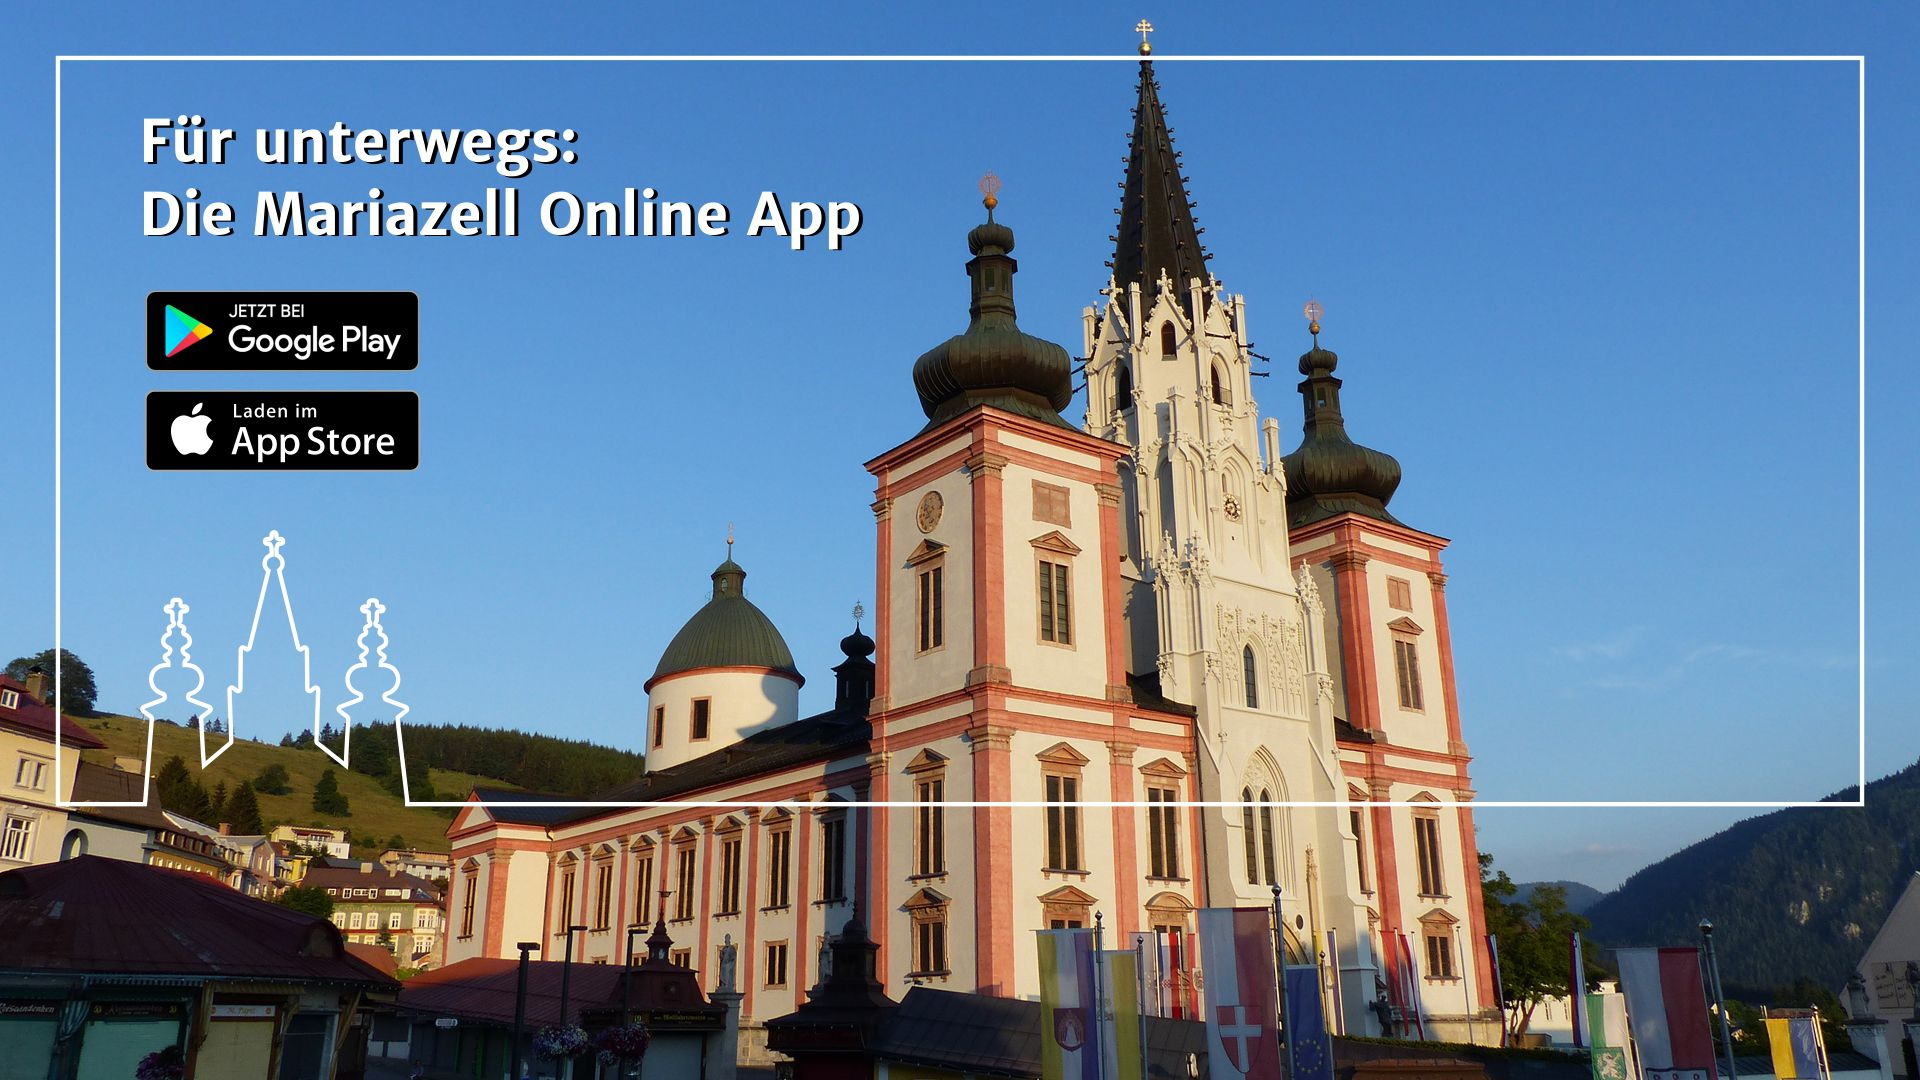 Mariazell Online App